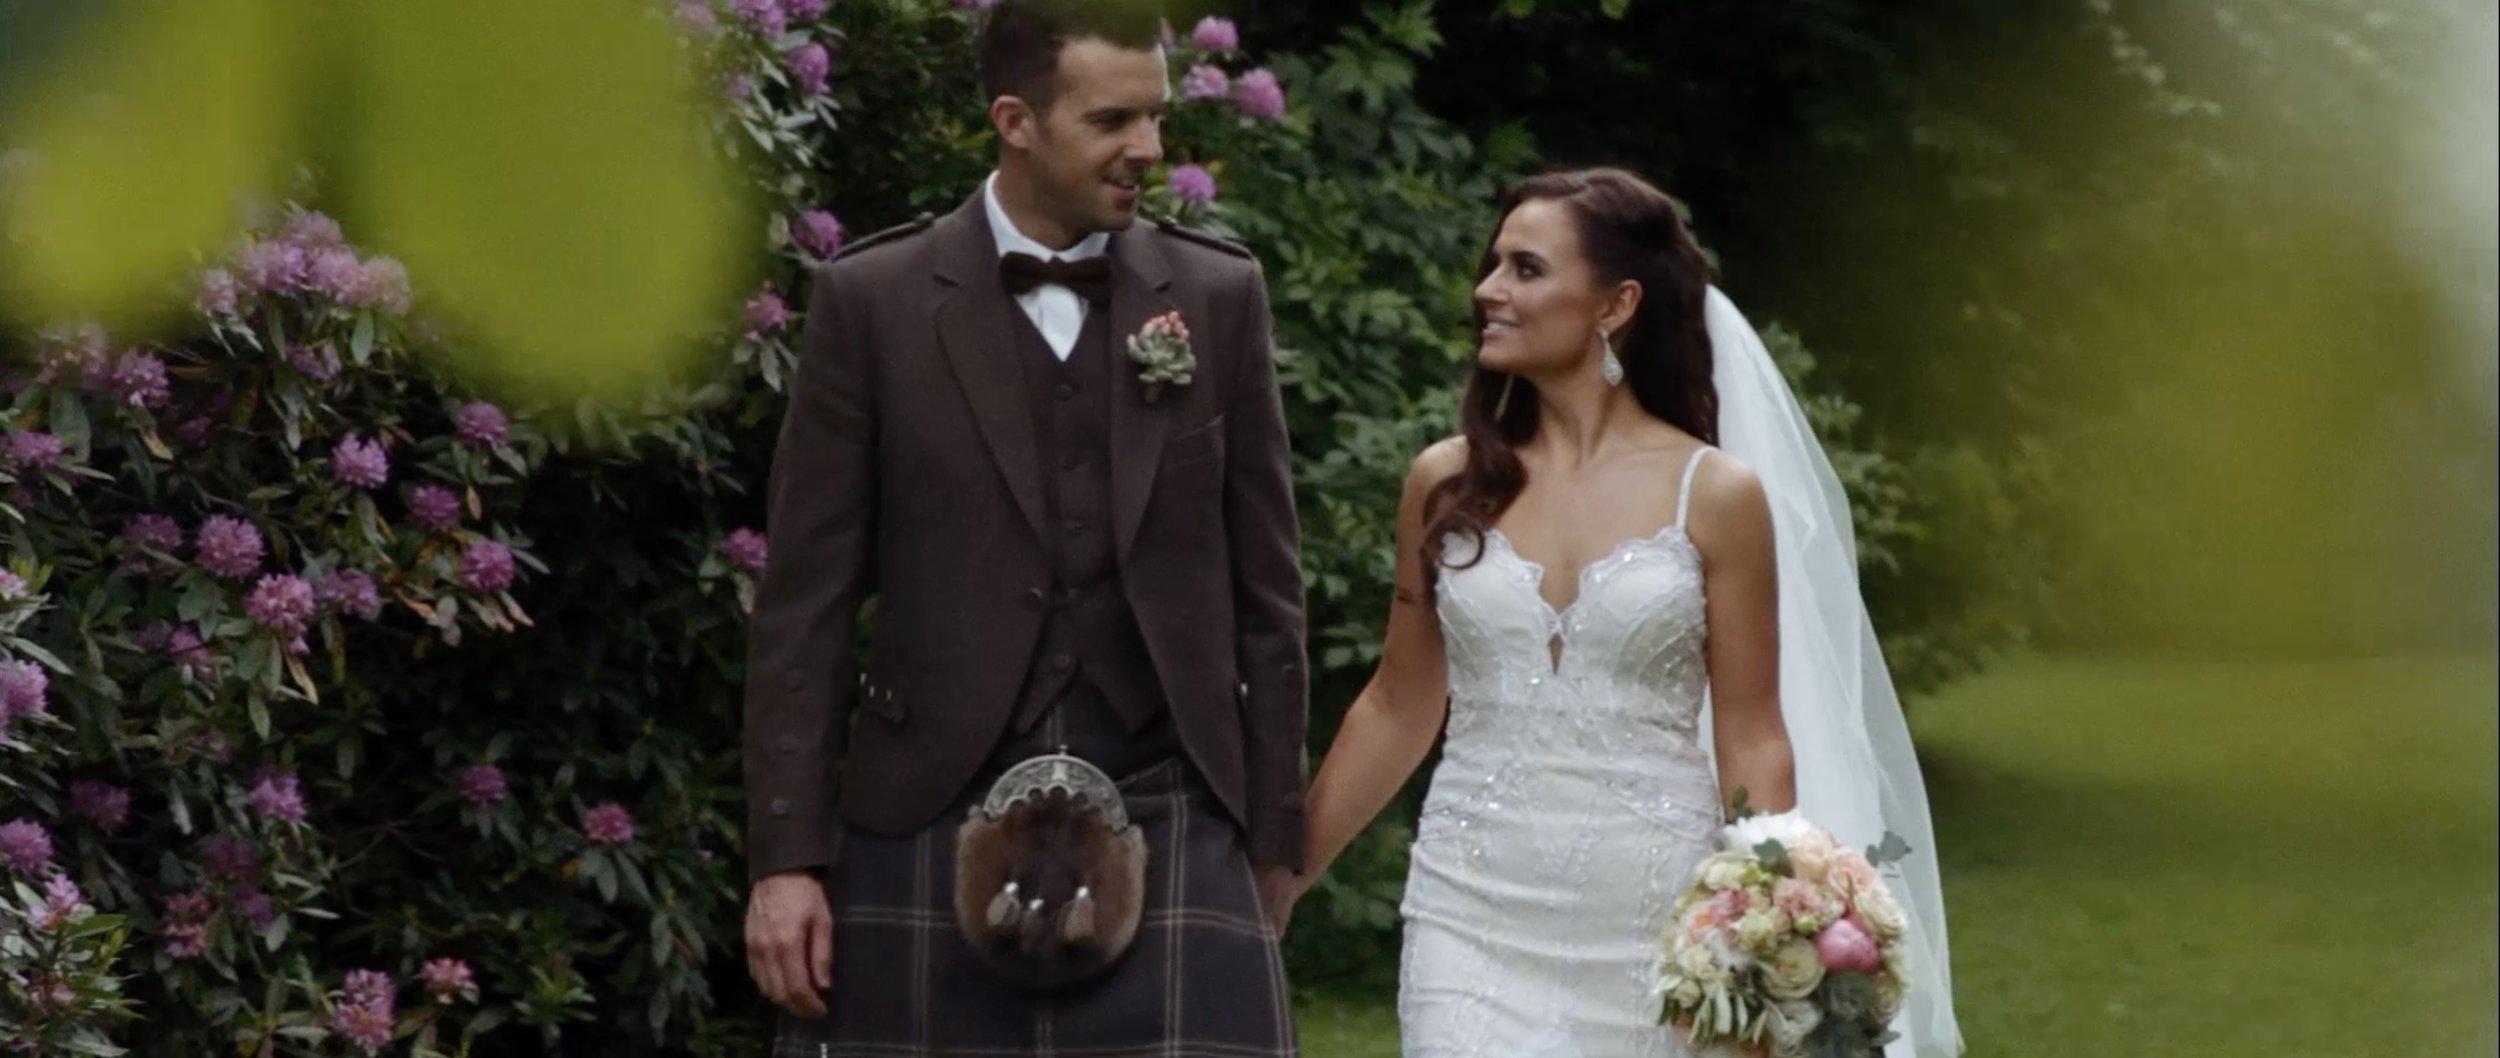 st-andrews-wedding-videographer_LL_06.jpg